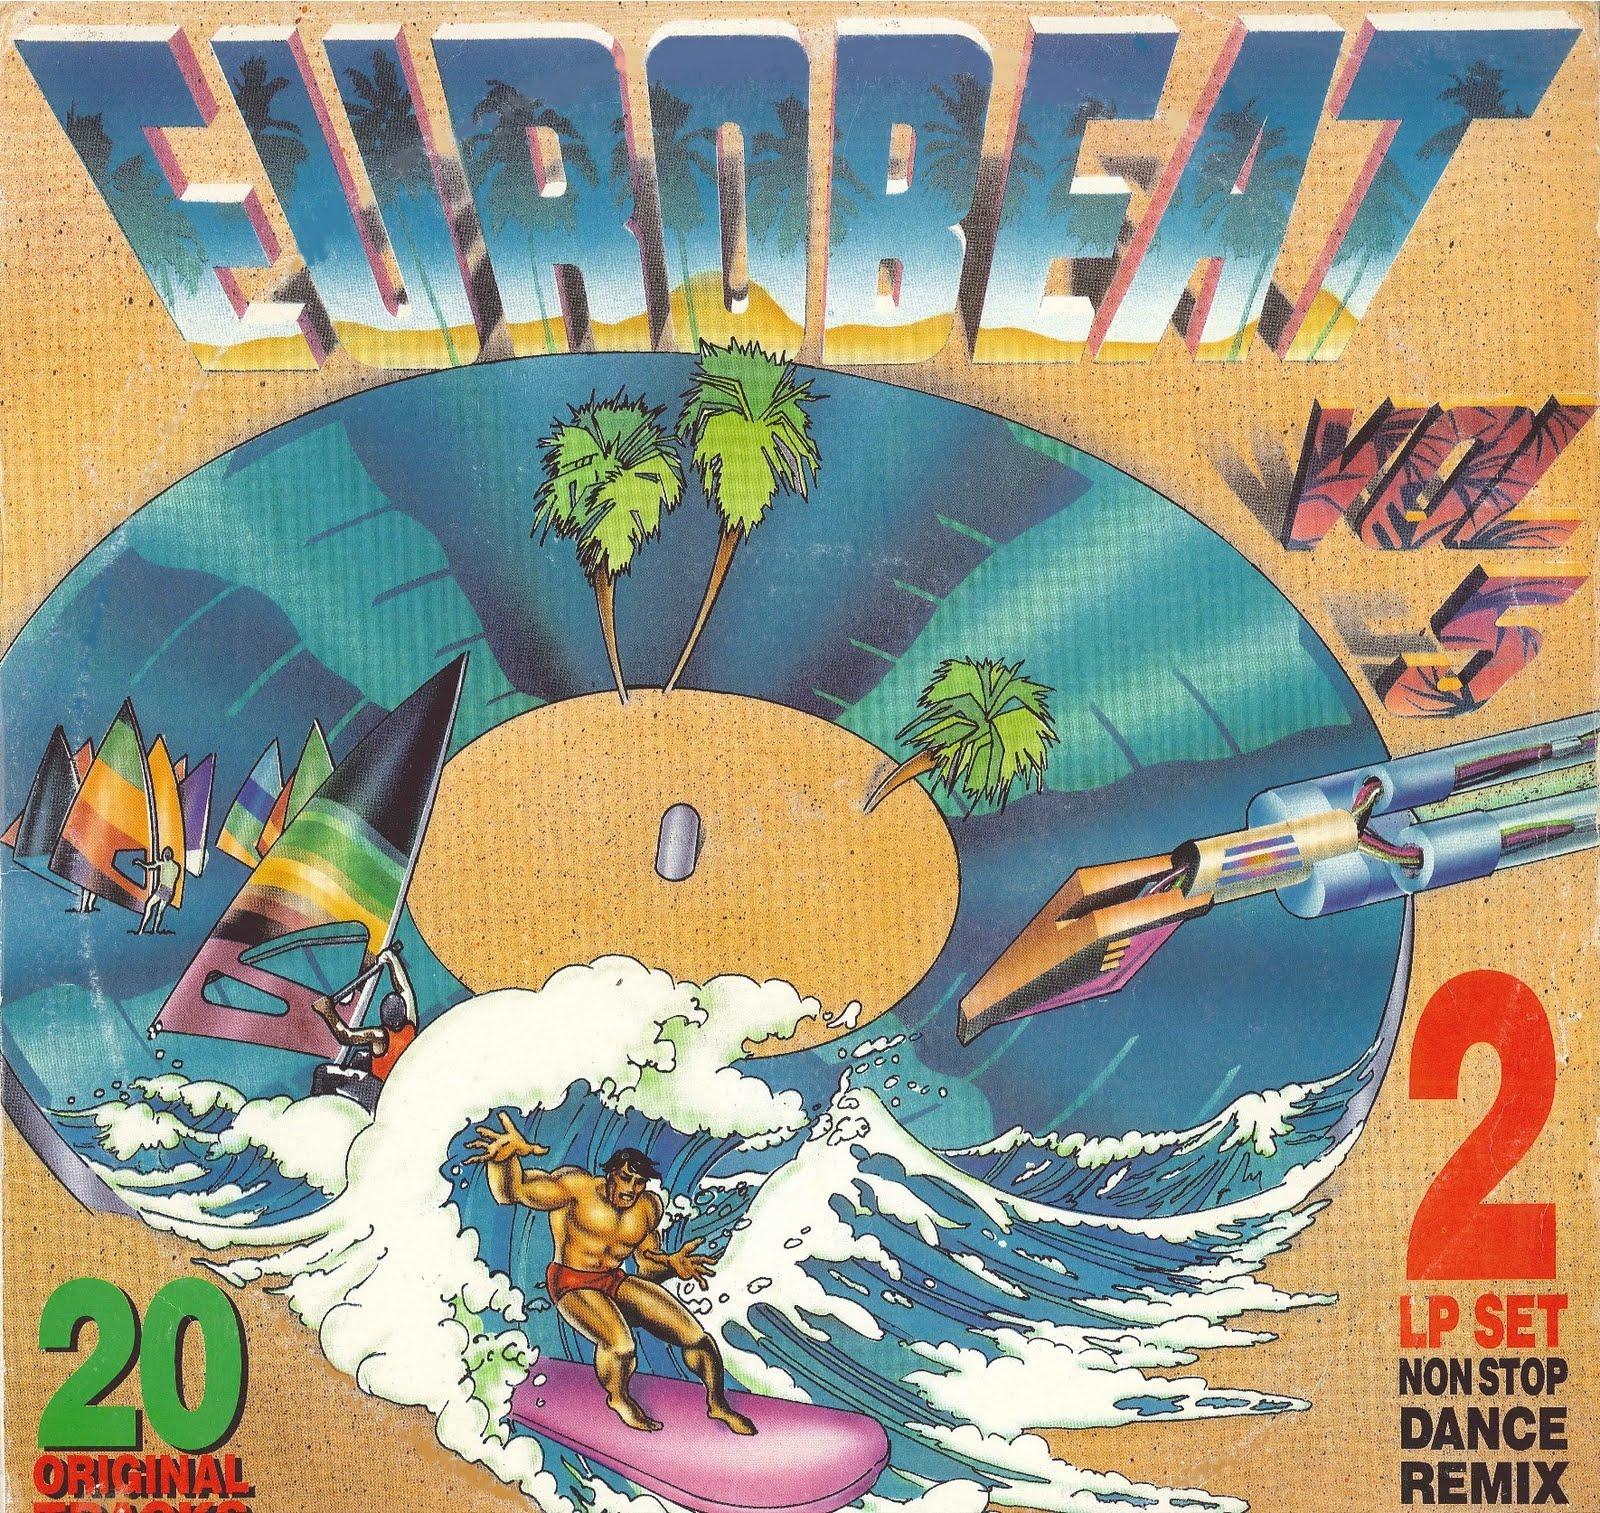 Eurobeat volume 5 90 minute non stop dance remix 2lp for Classic 90s house vol 2